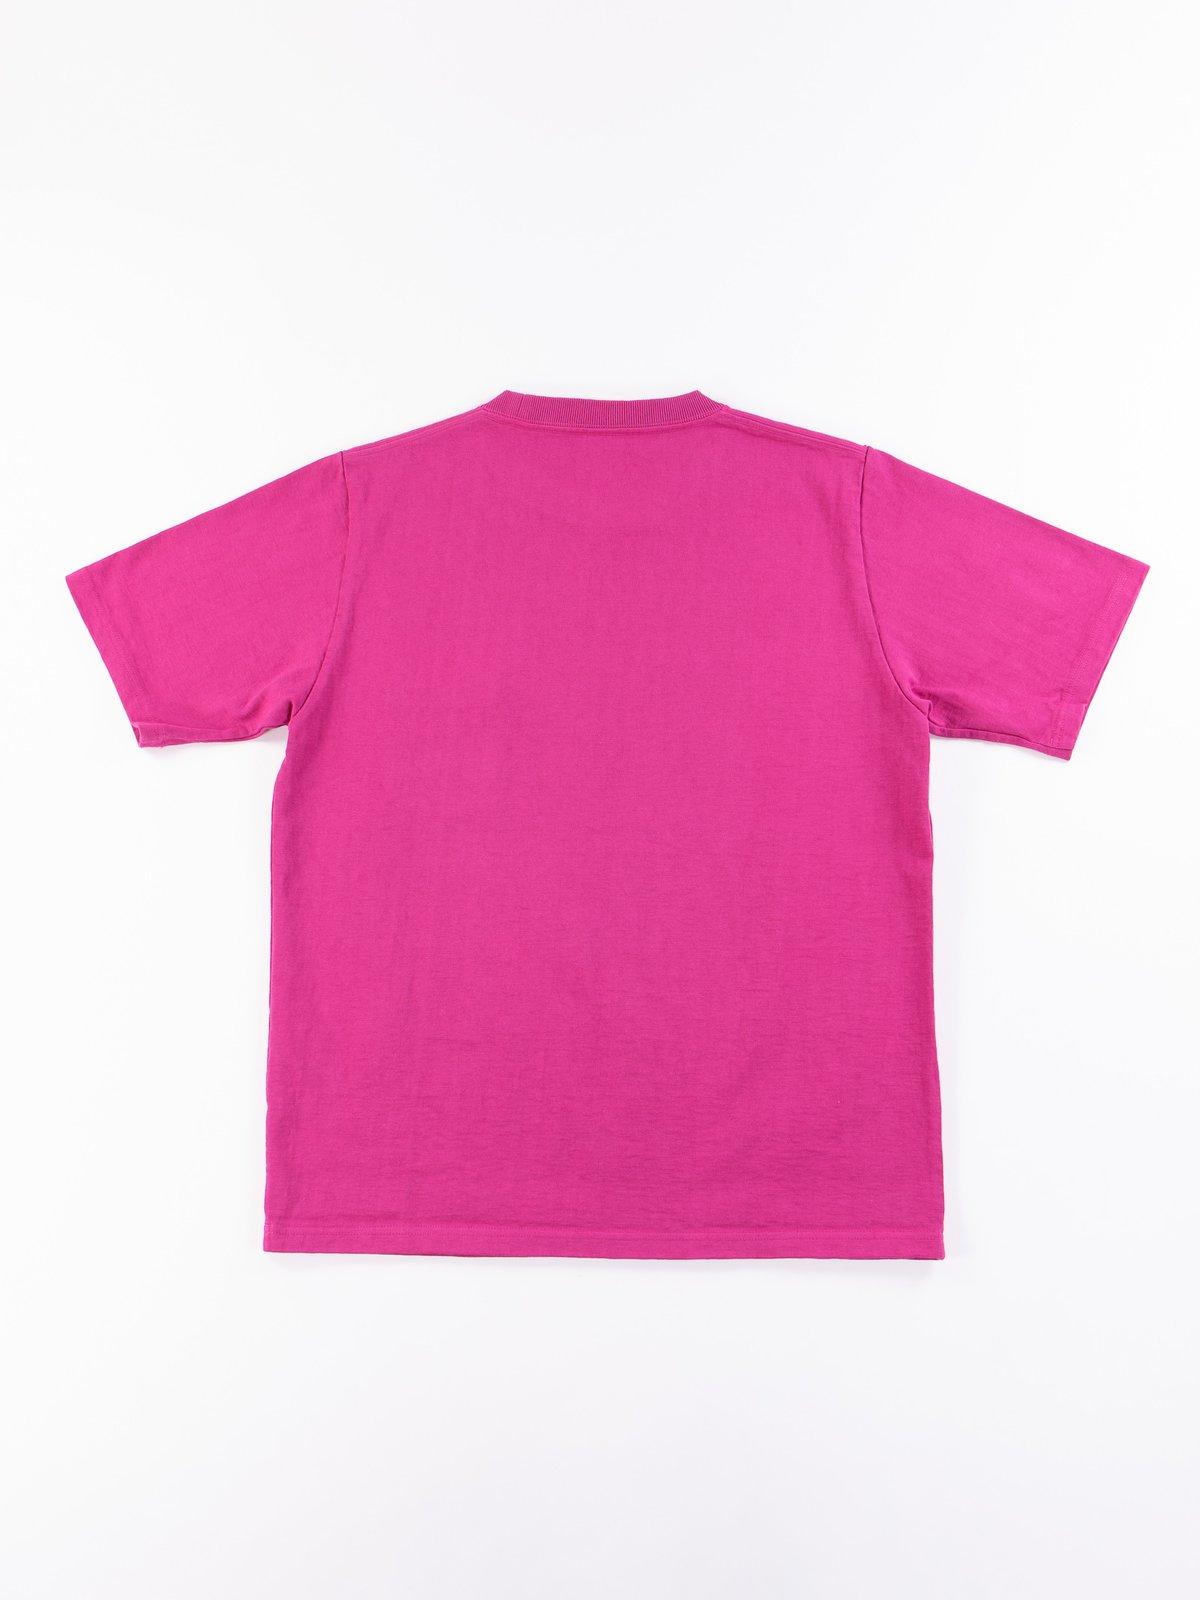 Ash Rose Dotsume Pocket T–Shirt - Image 6